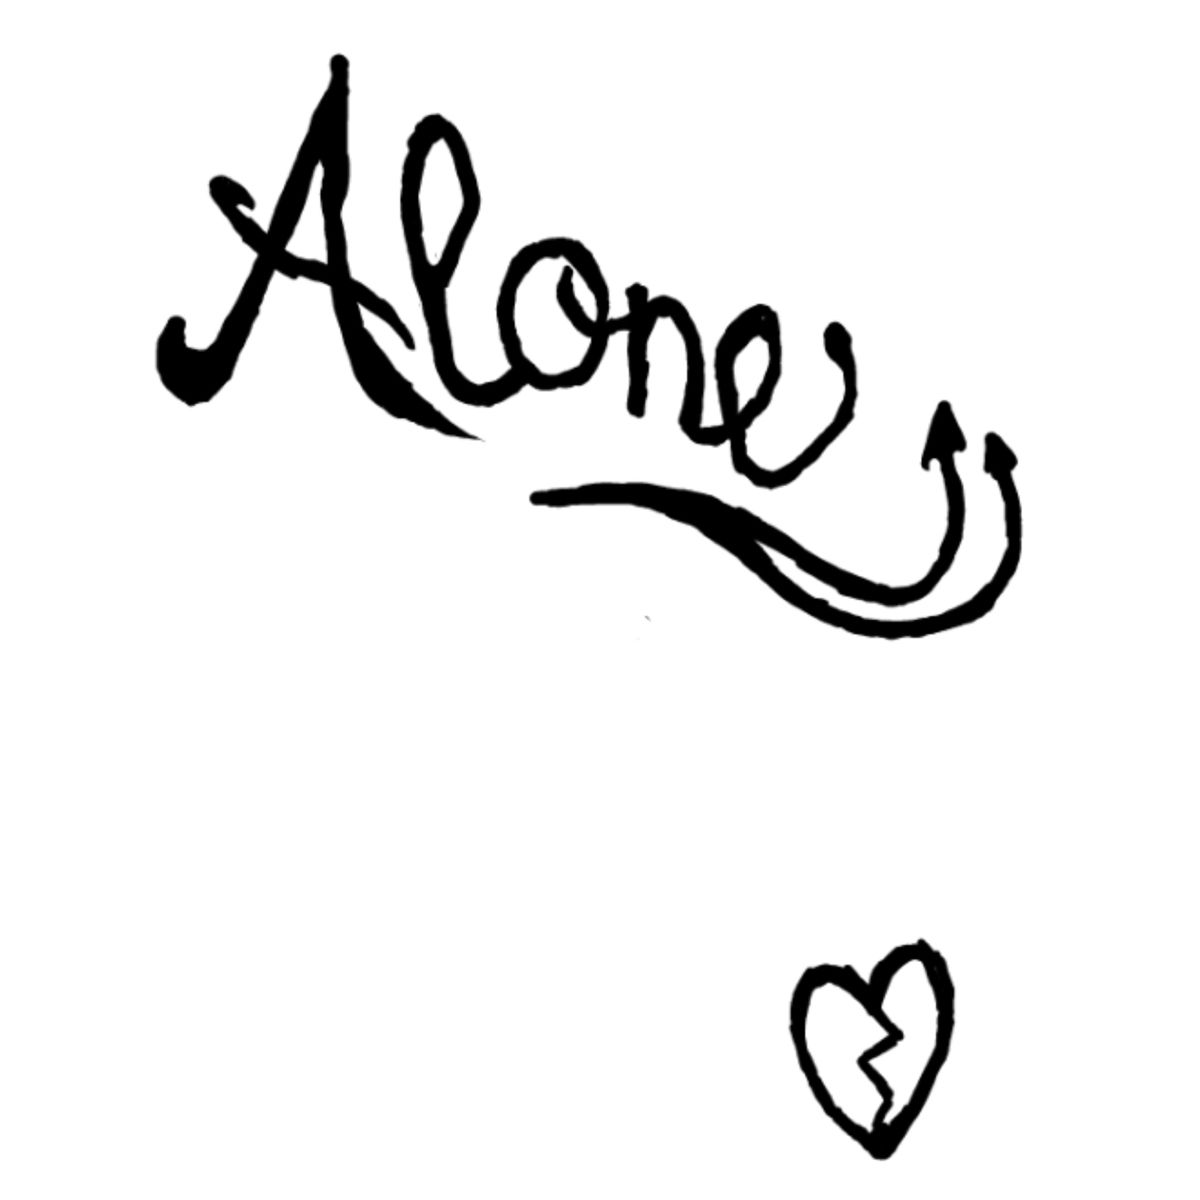 Alone Broken Heart Tattoo Broken Heart Tattoo Alone Tattoo Hope Tattoo